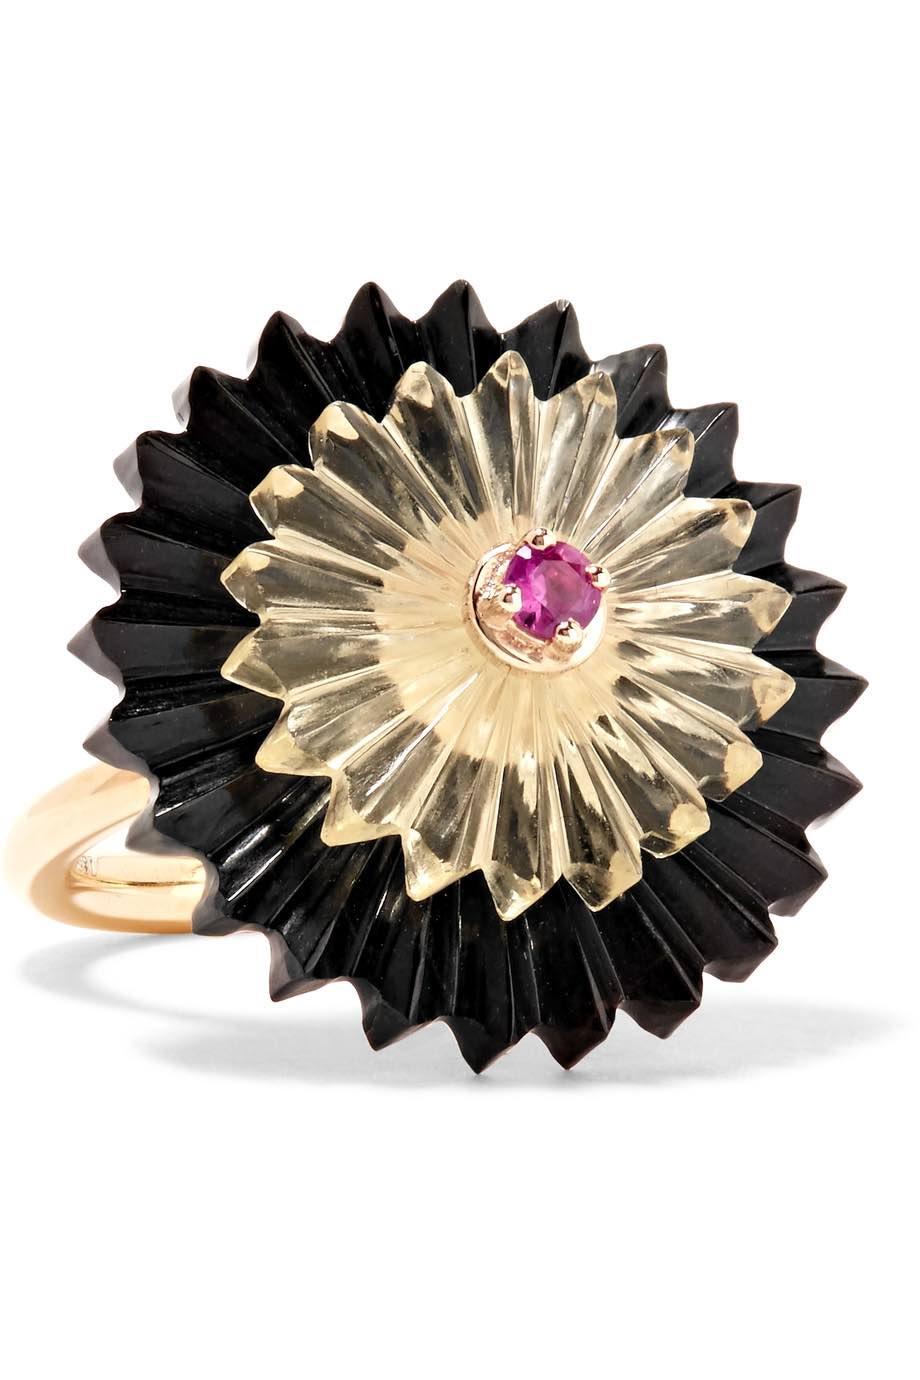 ALICE CICOLINI. Summer Snow Dark 9-karat gold multi-stone ring, £1,260. www.net-a-porter.com